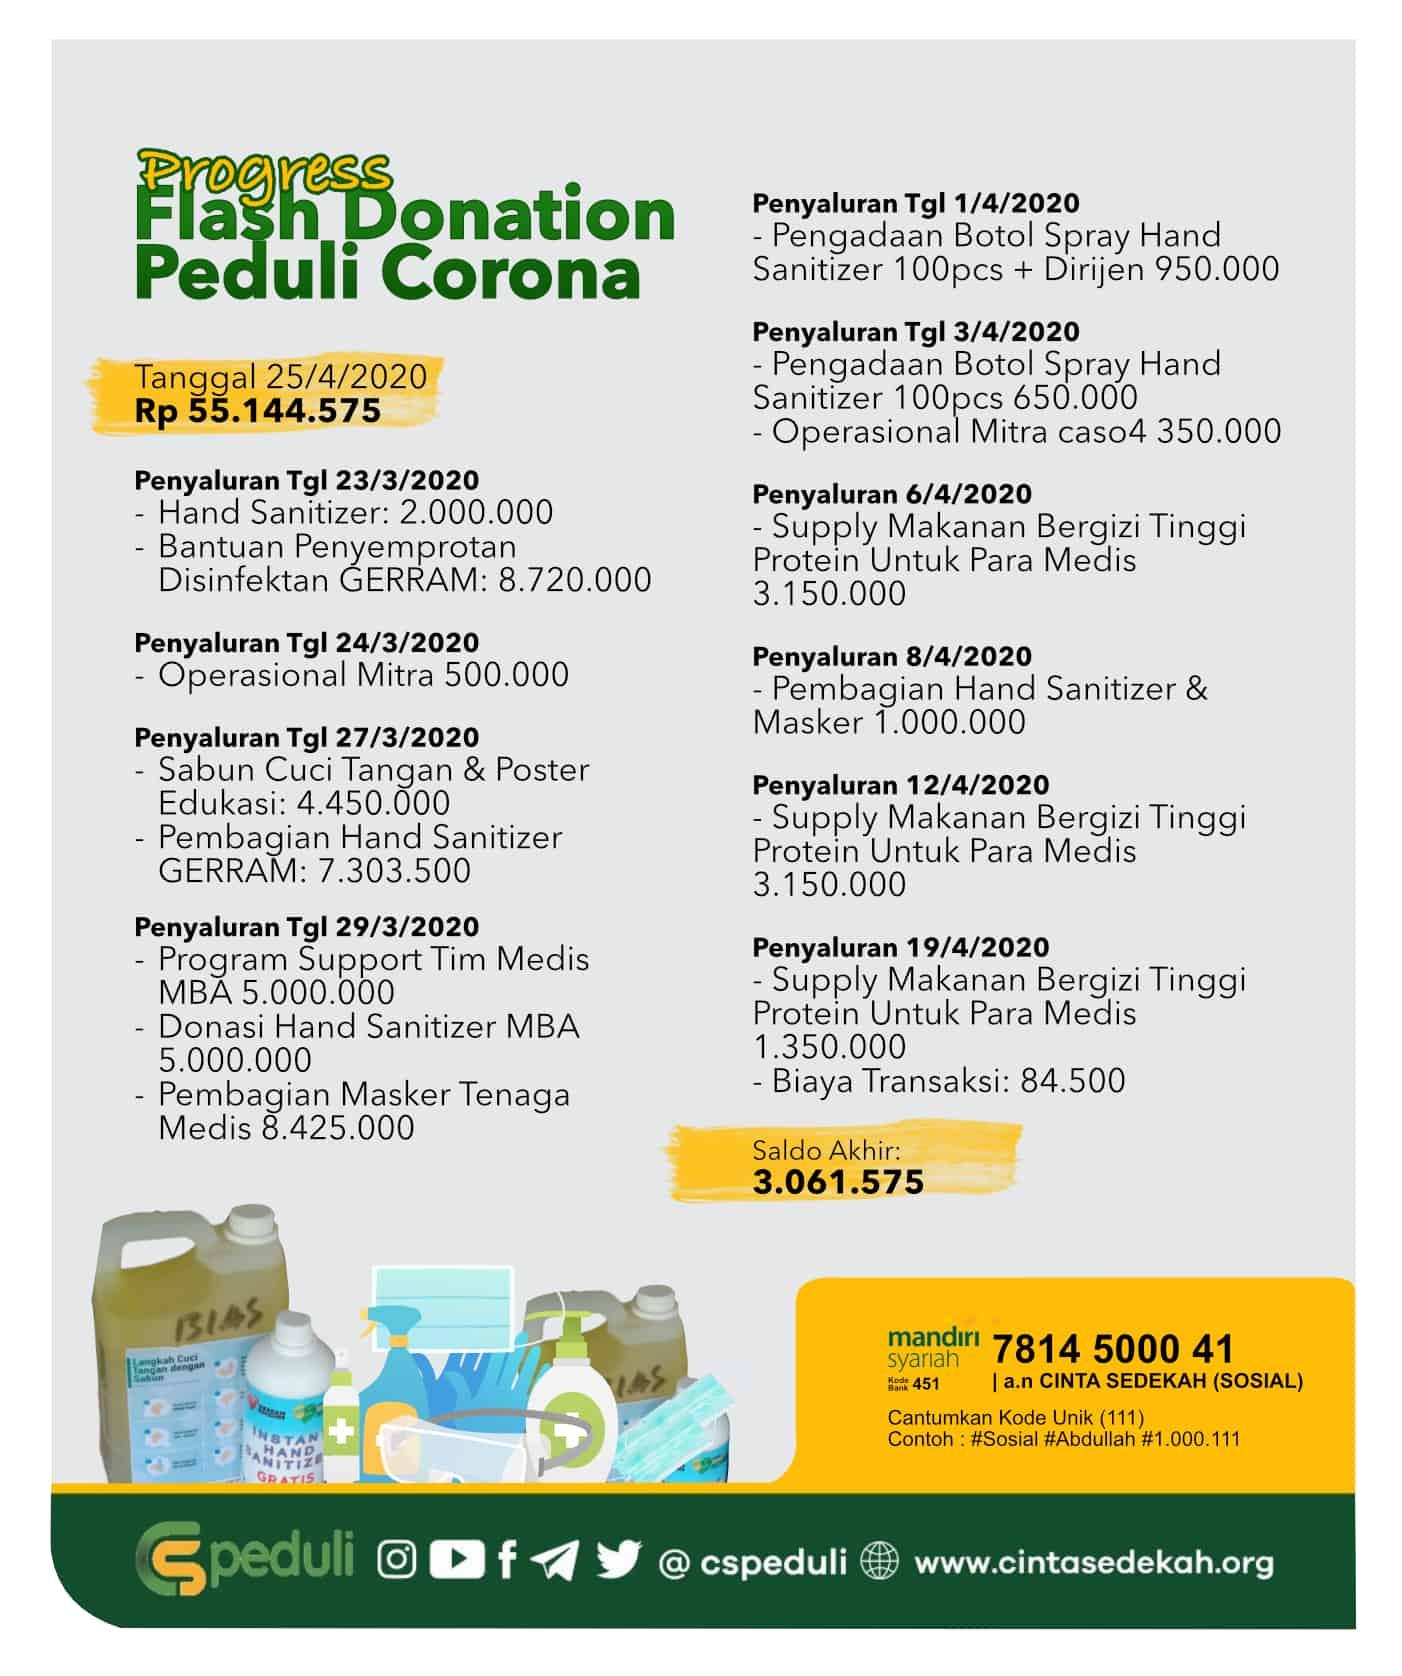 Flash Donasi antisipasi penyebaran virus Covid-19 (Corona) - Update Progress 25 April 2020